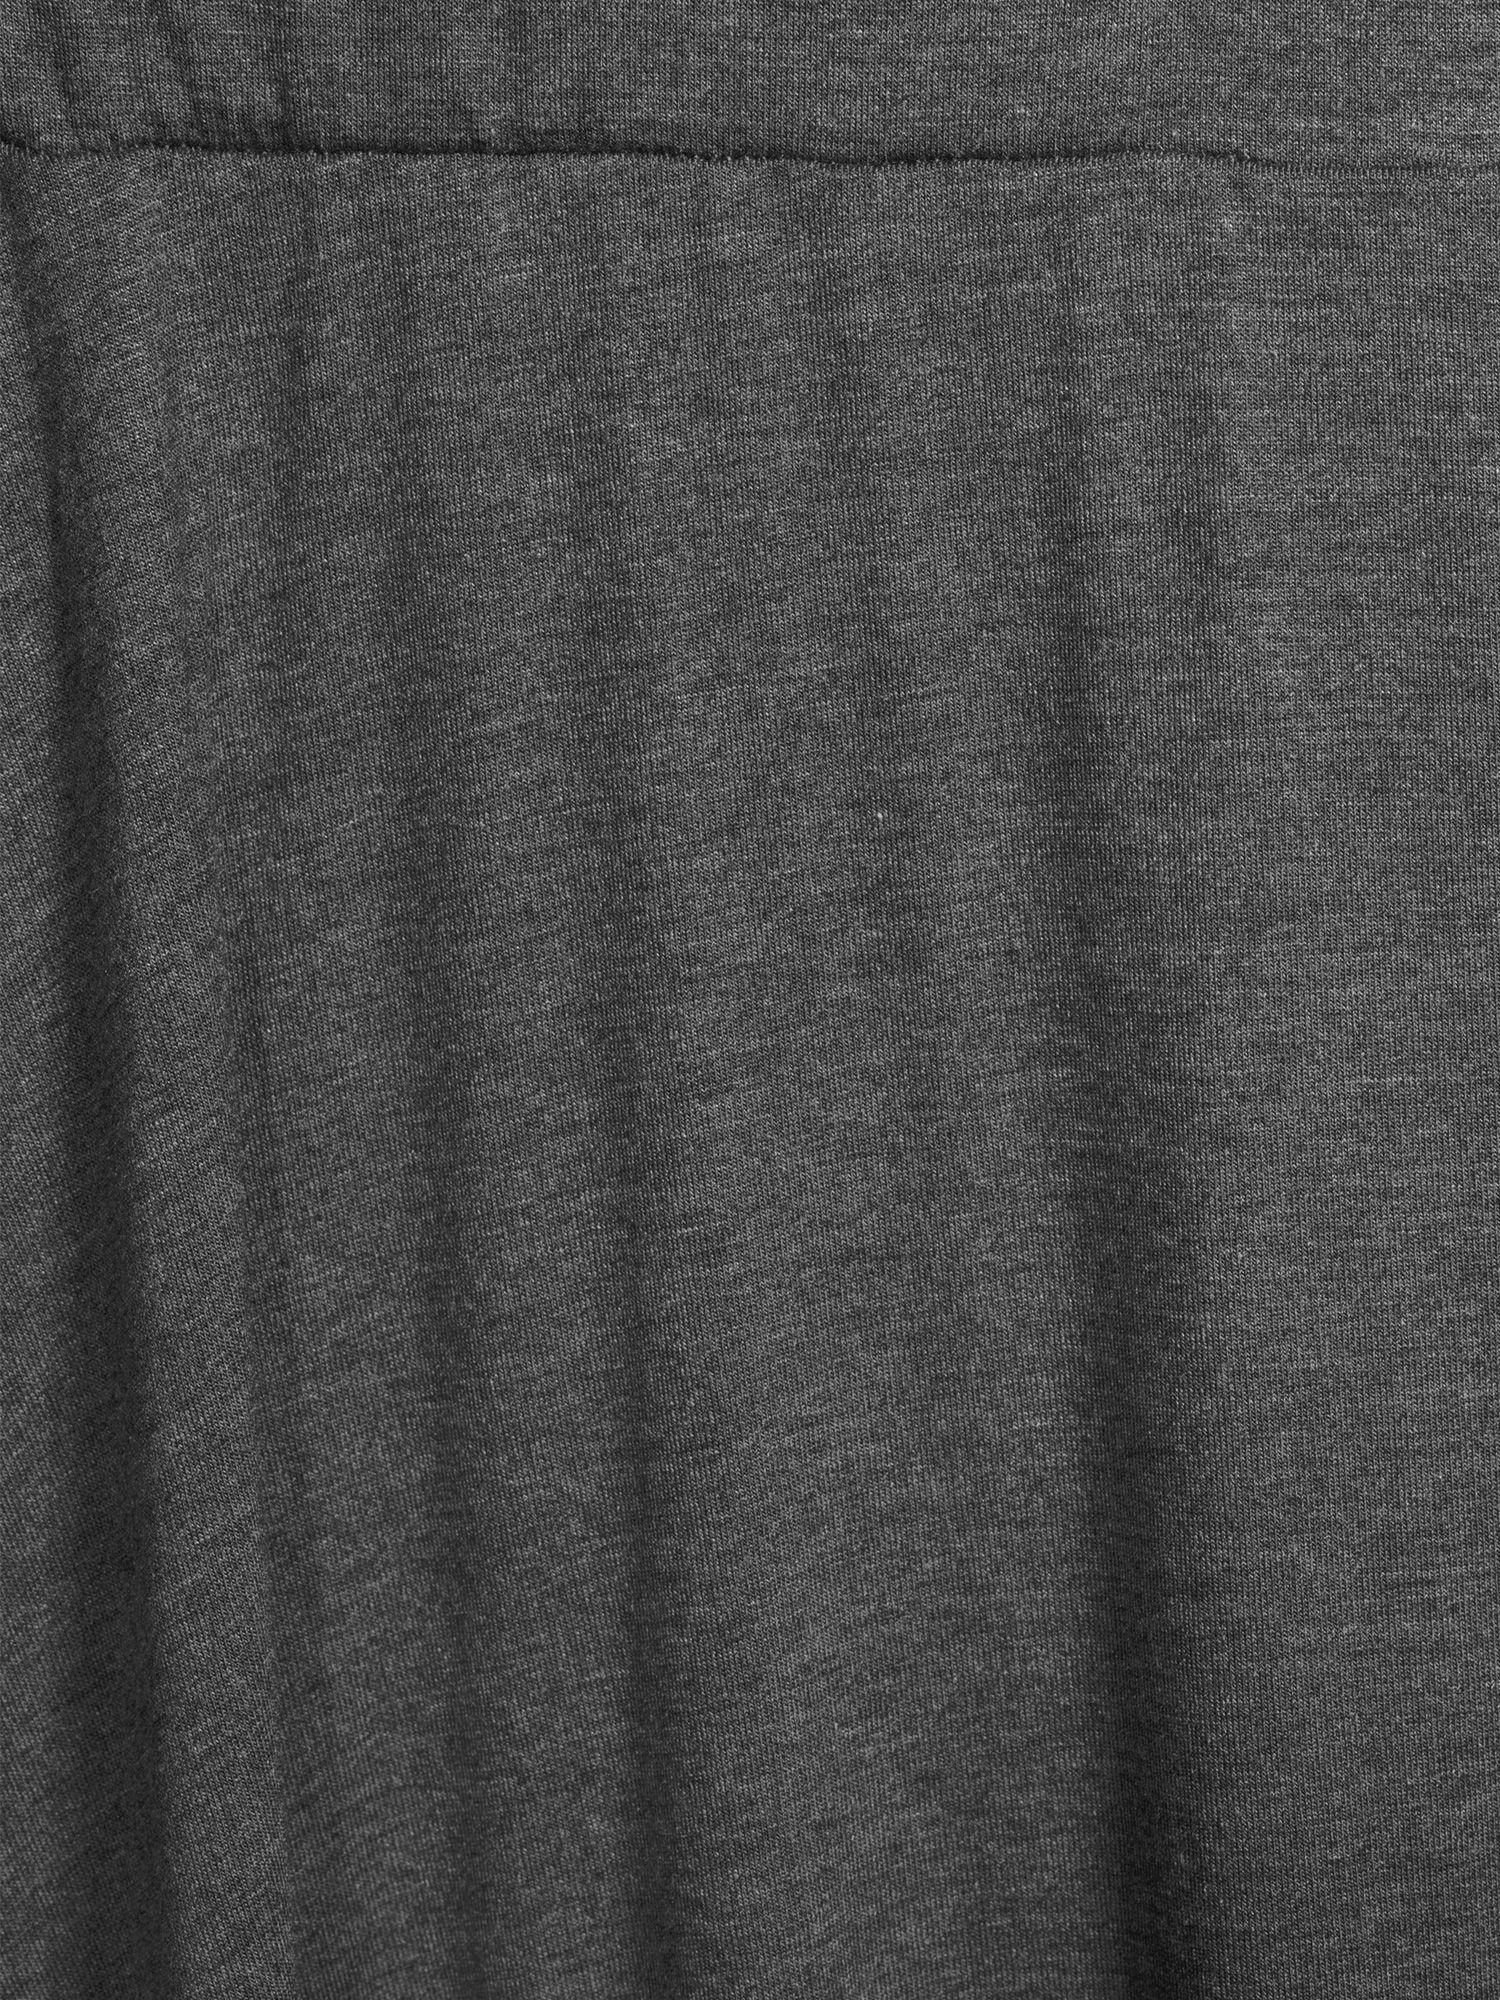 Ella Samani Ella Samani Women S Plus Size Pants Skirt Overlay Walmart Com In 2020 Plus Size Pants Skirt Pants Comfy Fashion [ 2000 x 1500 Pixel ]